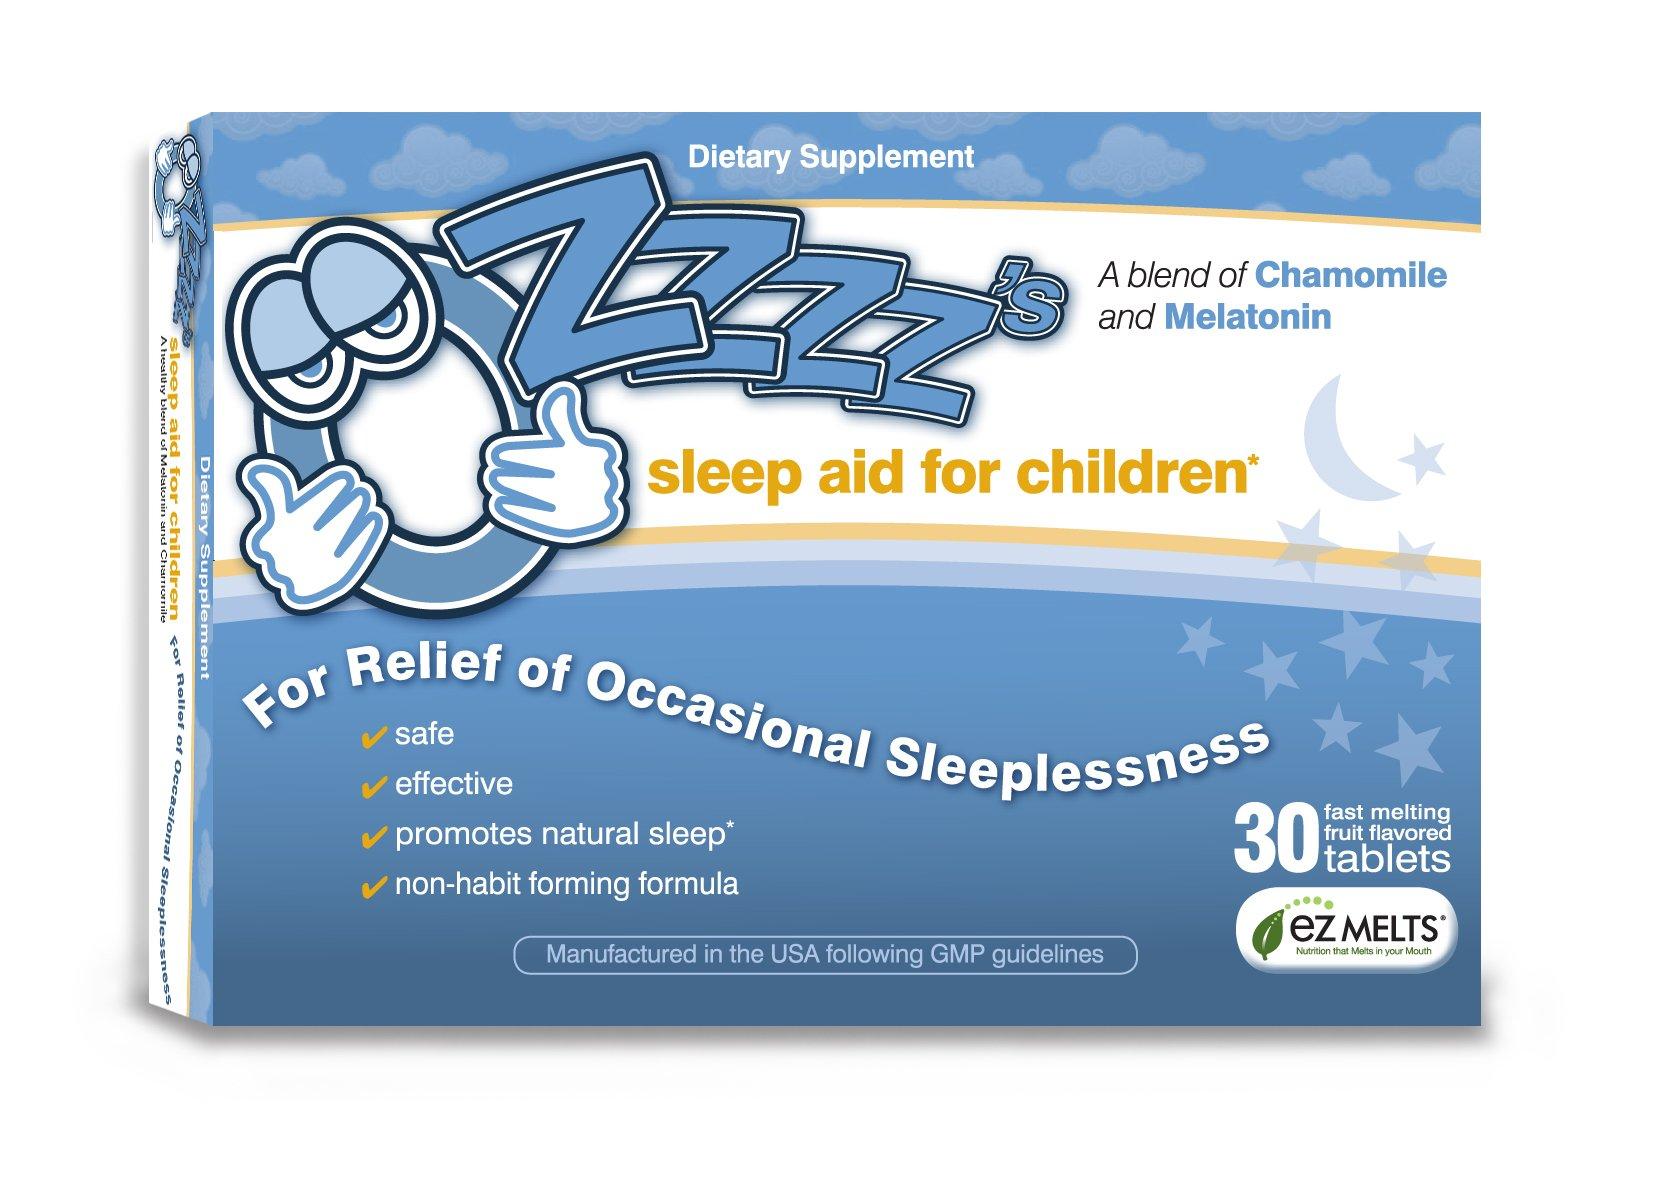 clonazepam for sleep aid for kids